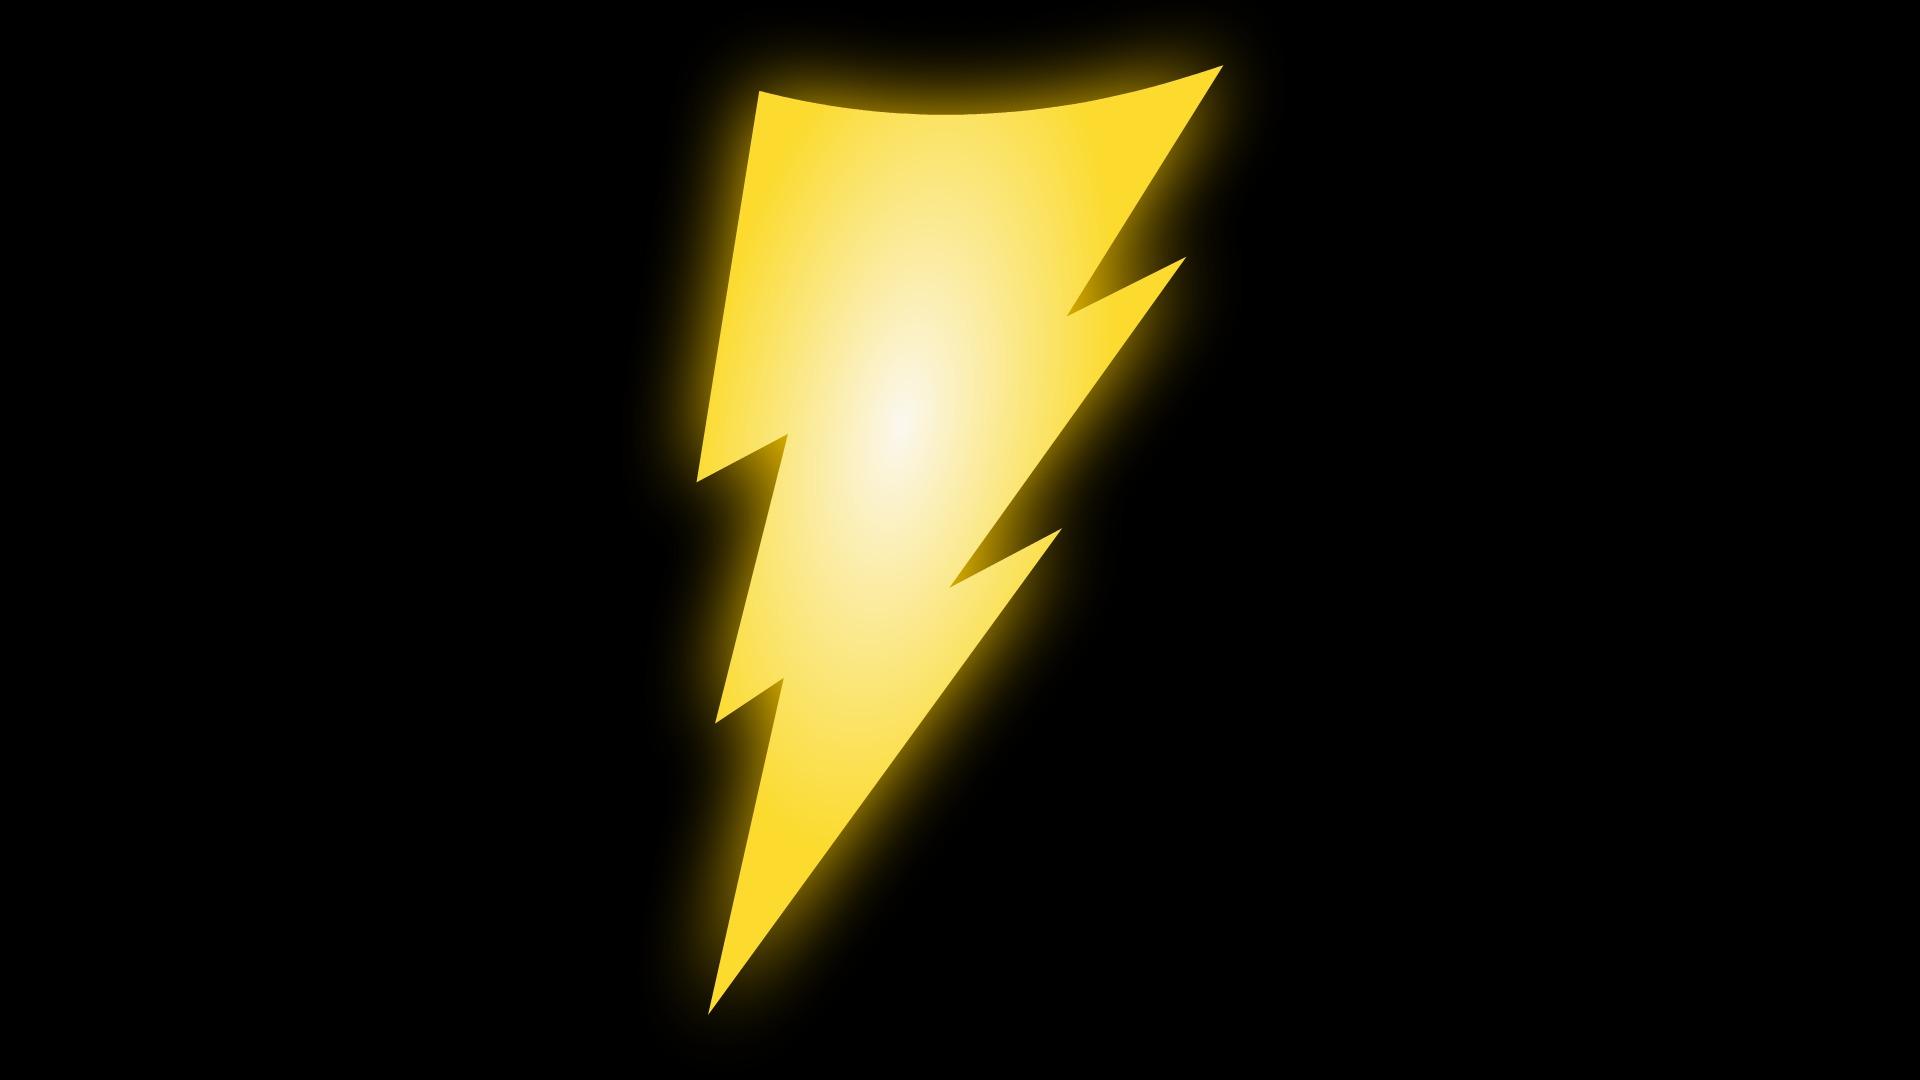 download wallpaper yellow black adam lightning black